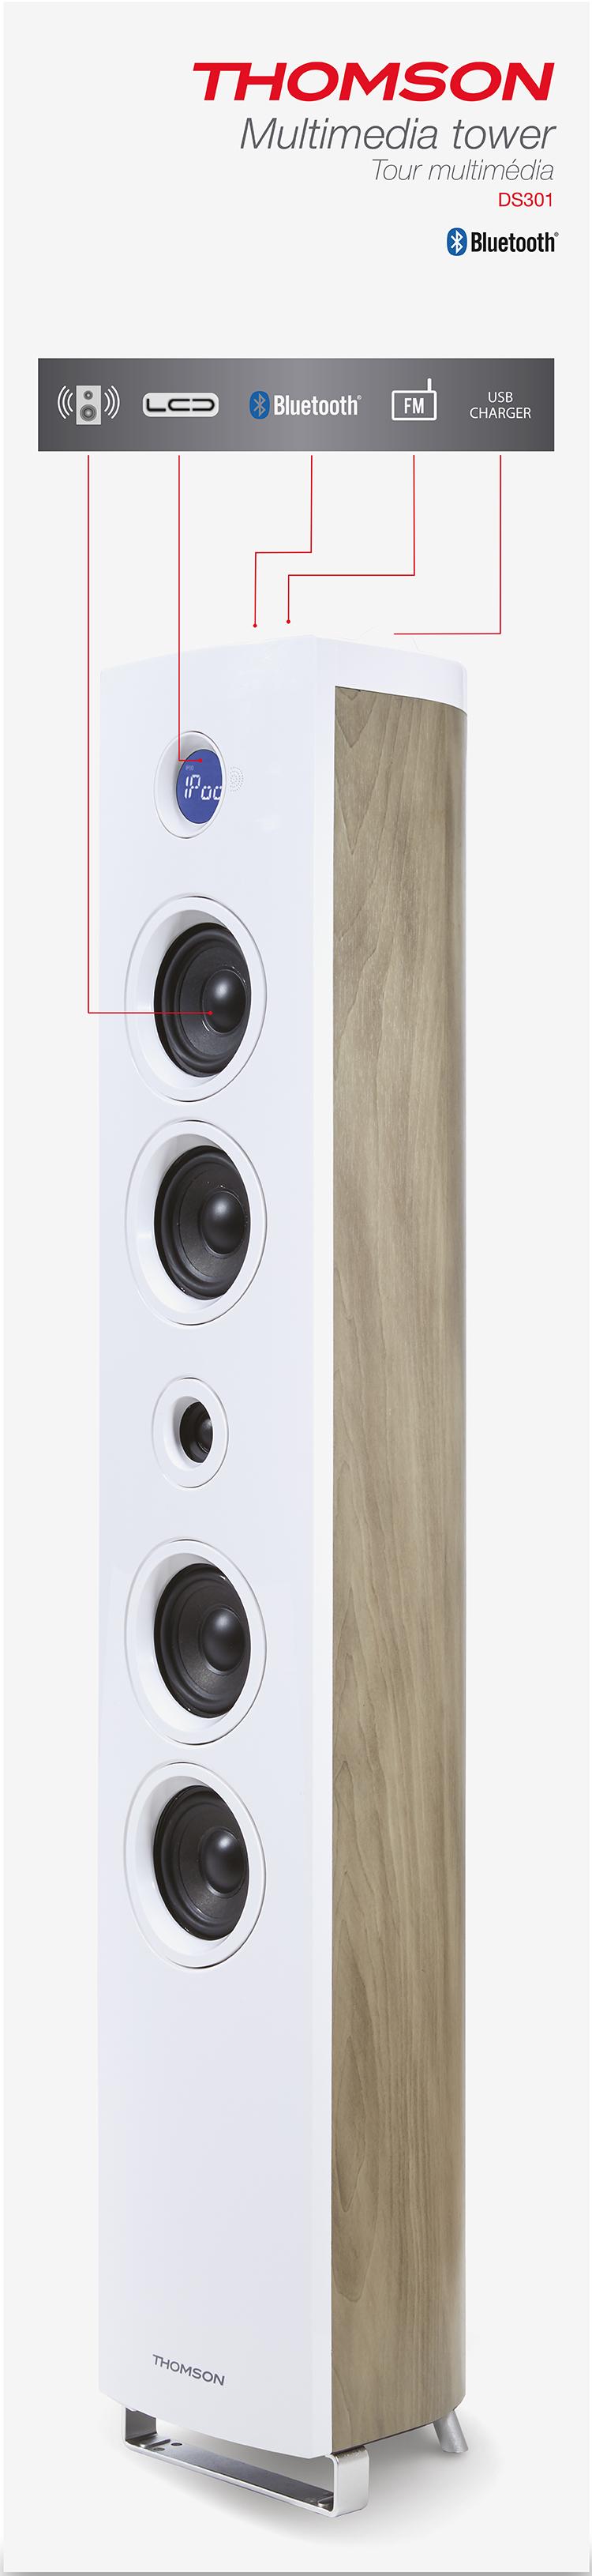 Multimedia Tower 'Wood' (White) - Image   #2